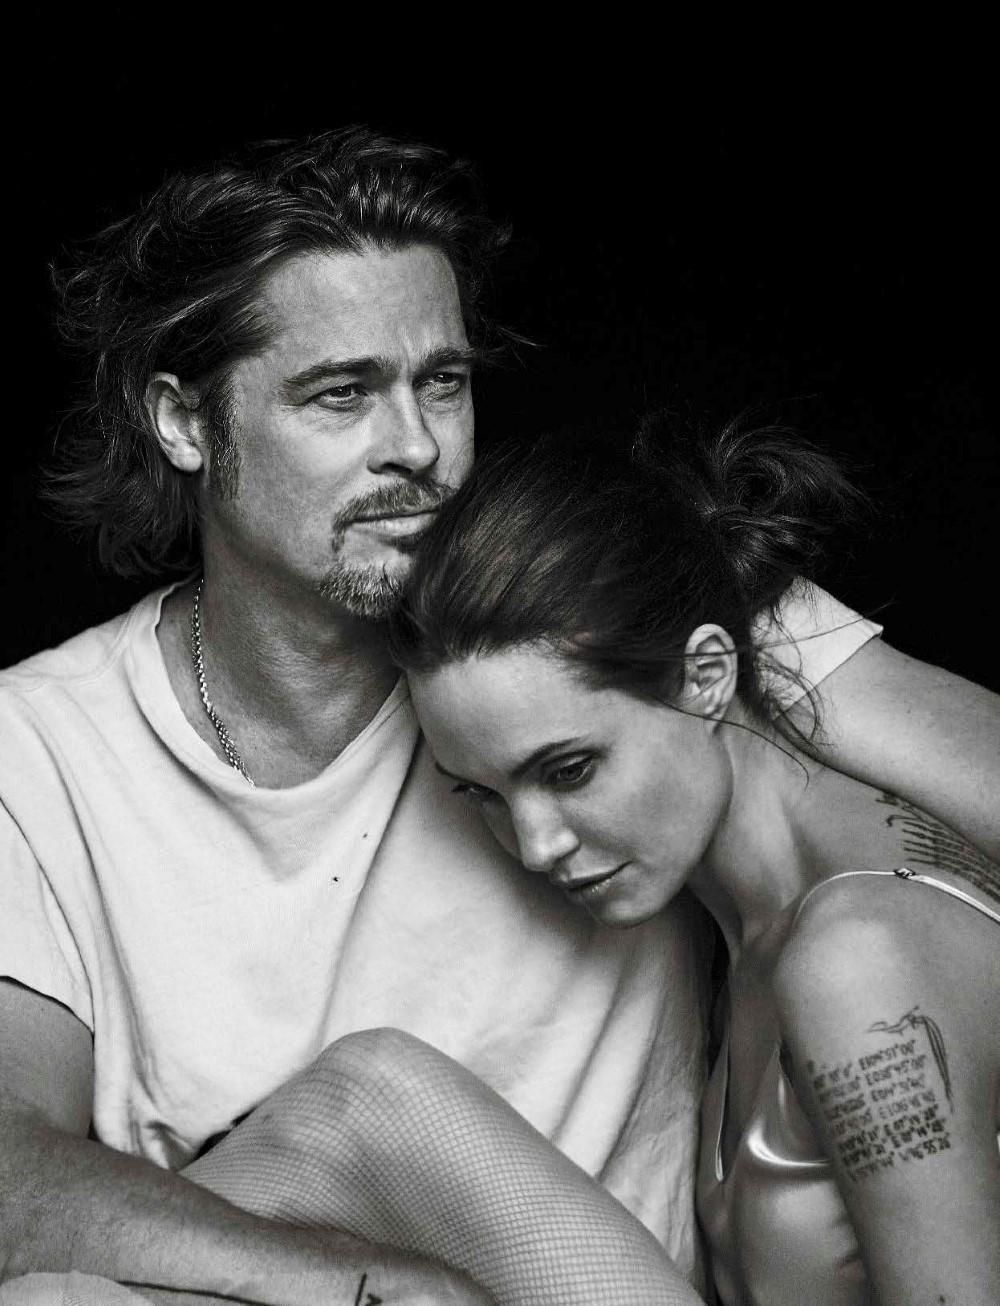 Vanity-Fair-Italia-November-2015-Angelina-Jolie-and-Brad-Pitt-by-Peter-Lindbergh-00.jpg